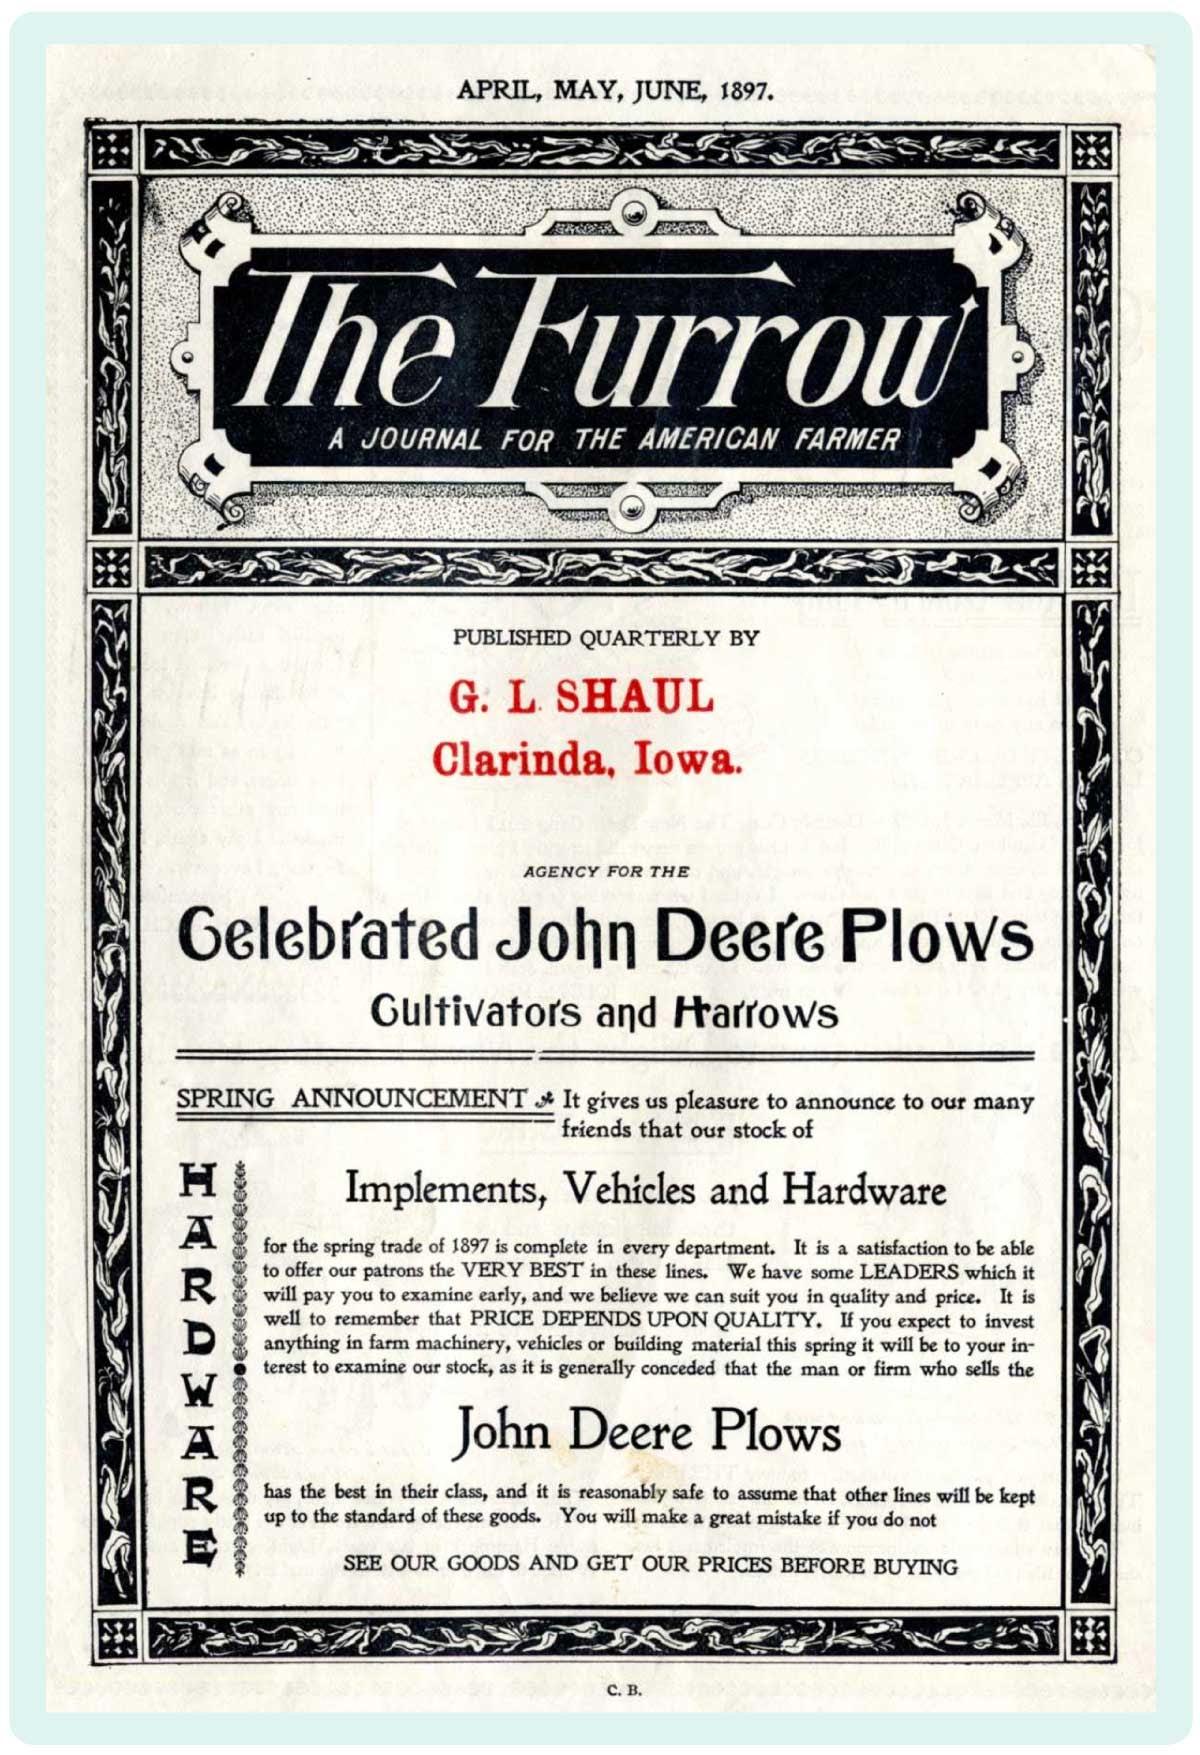 The Furrow by John Deere